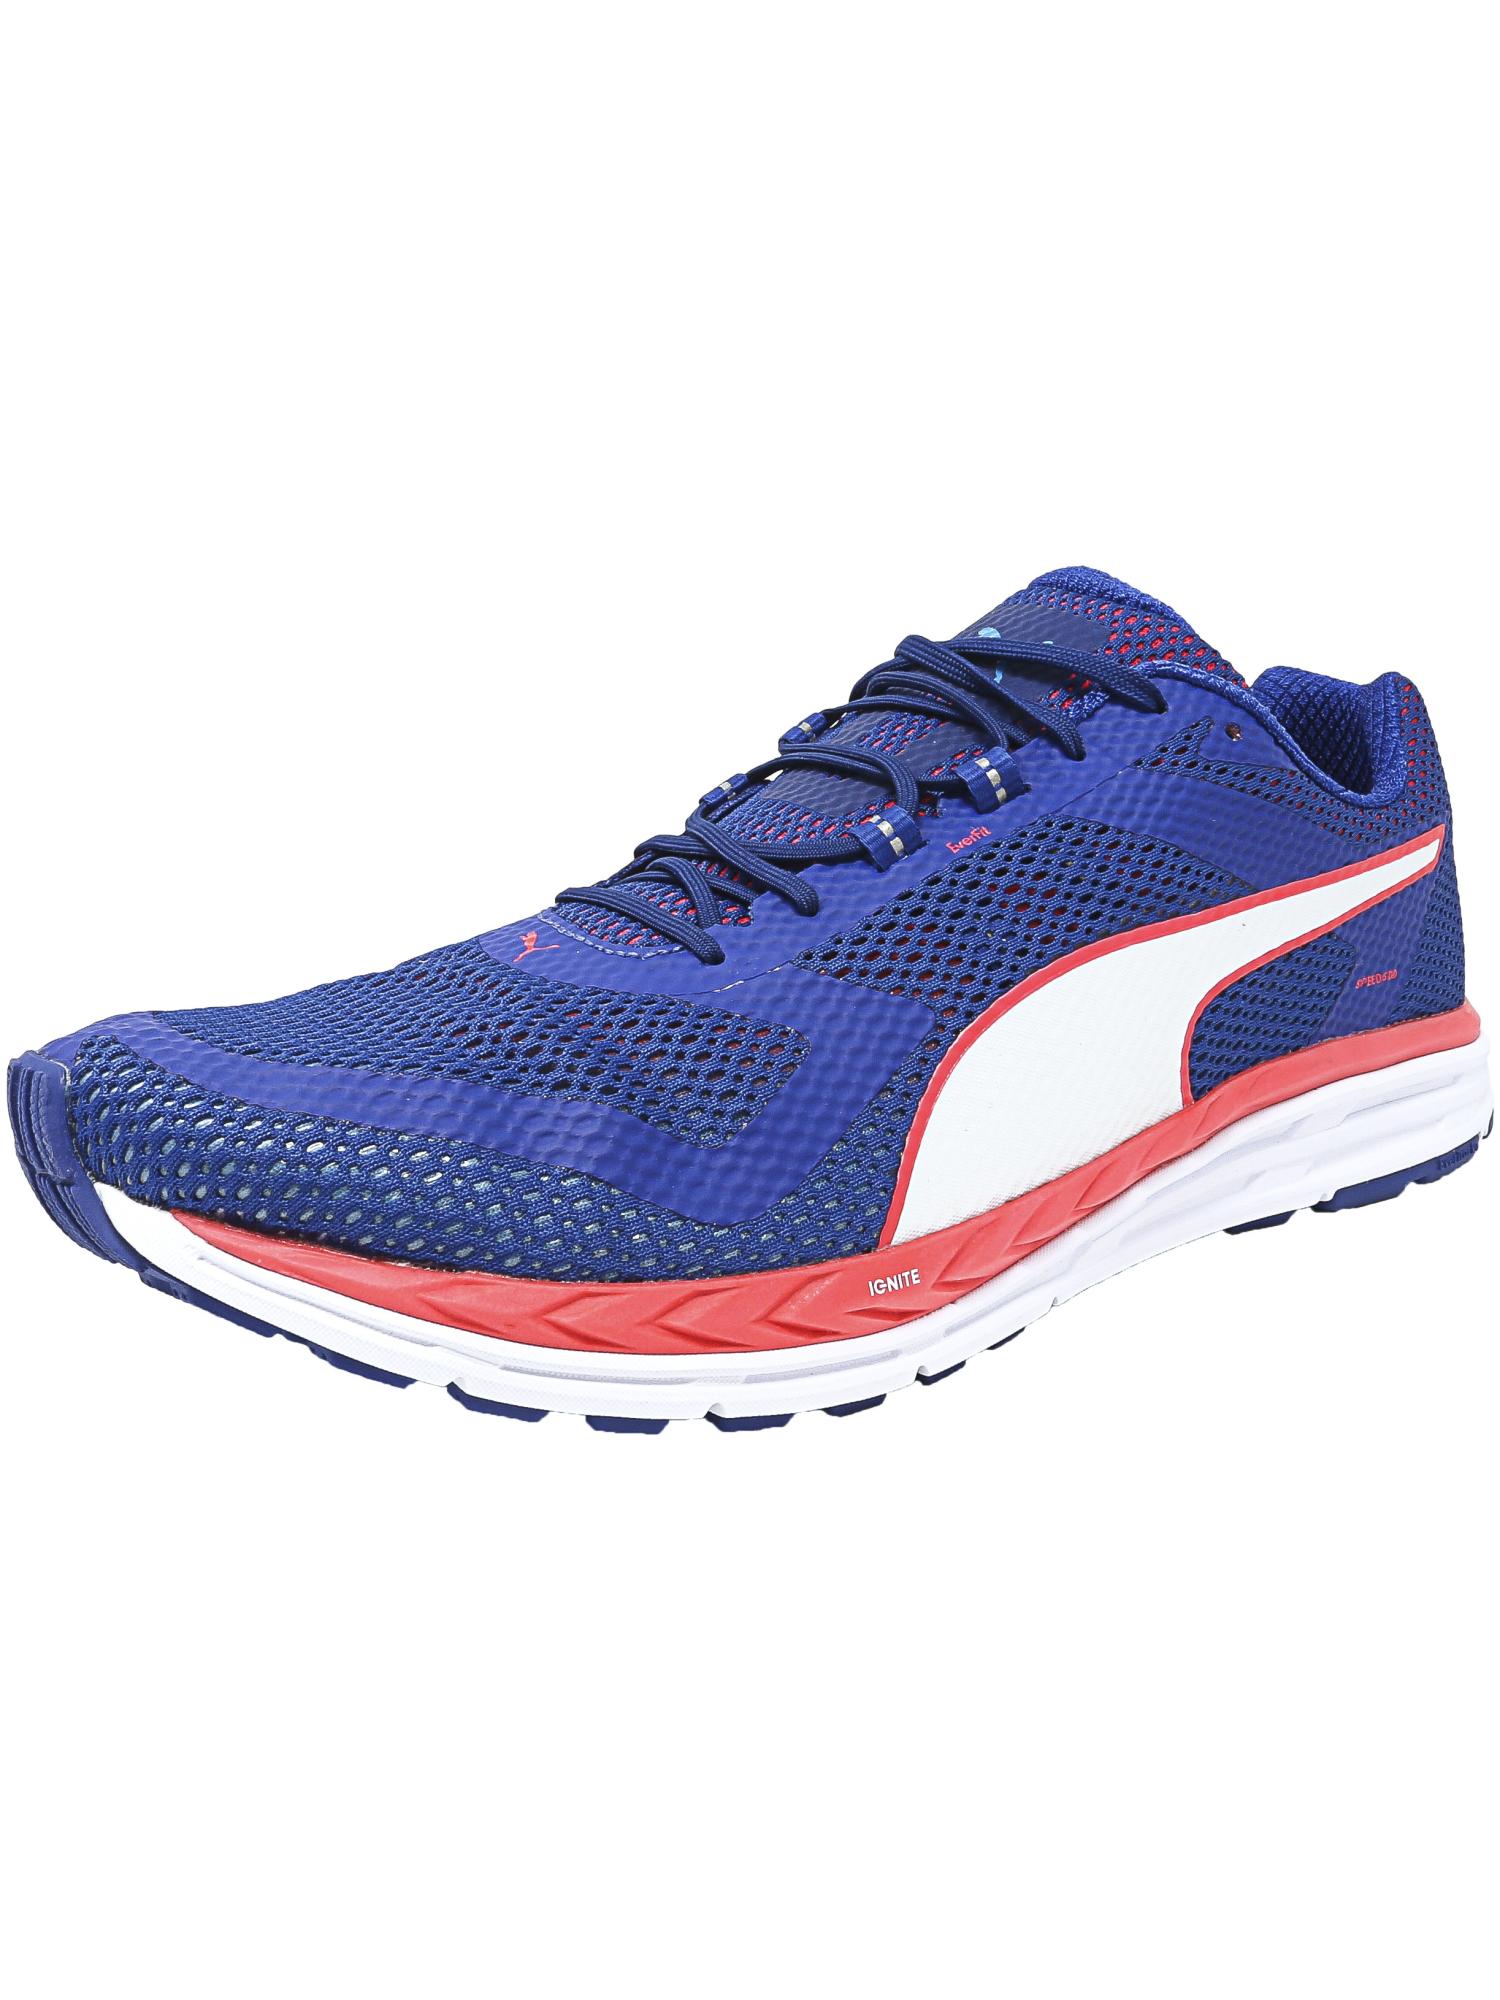 Puma Men's Speed 500 Ignite Shoe Ankle-High Fabric Running Shoe Ignite 69a21c